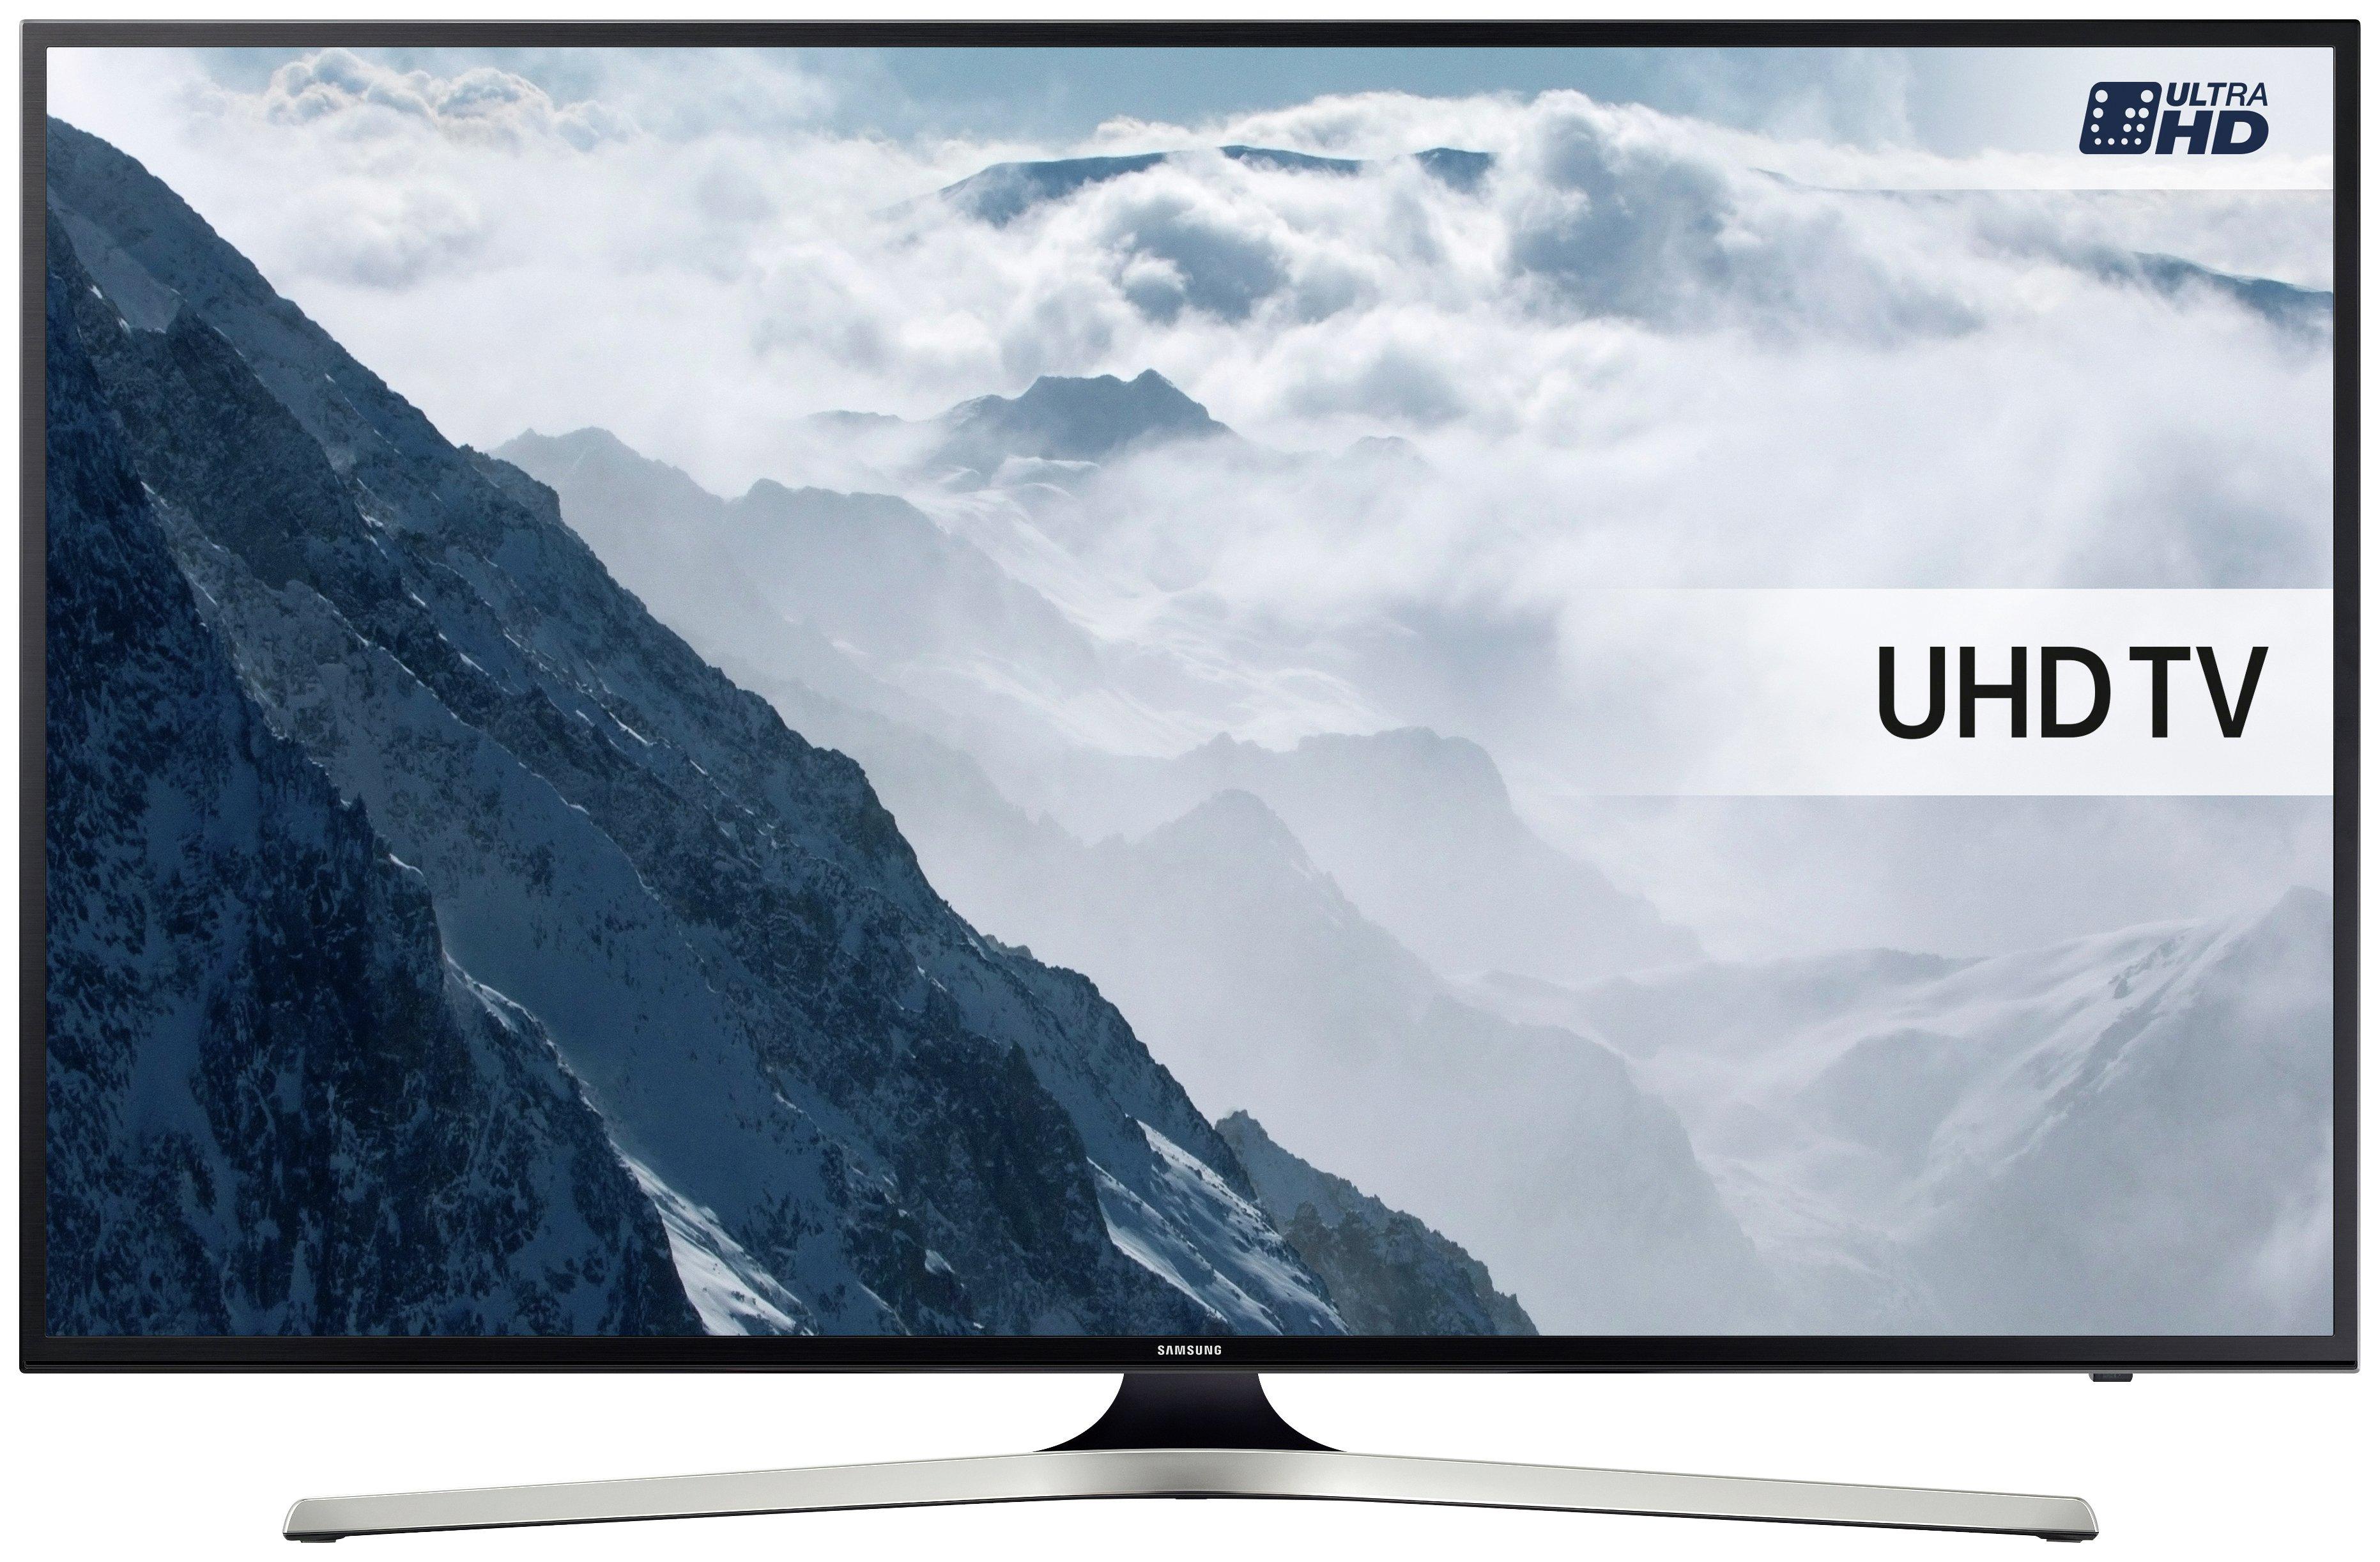 Samsung 55KU6020 55 Inch Ultra HD Smart LED TV.